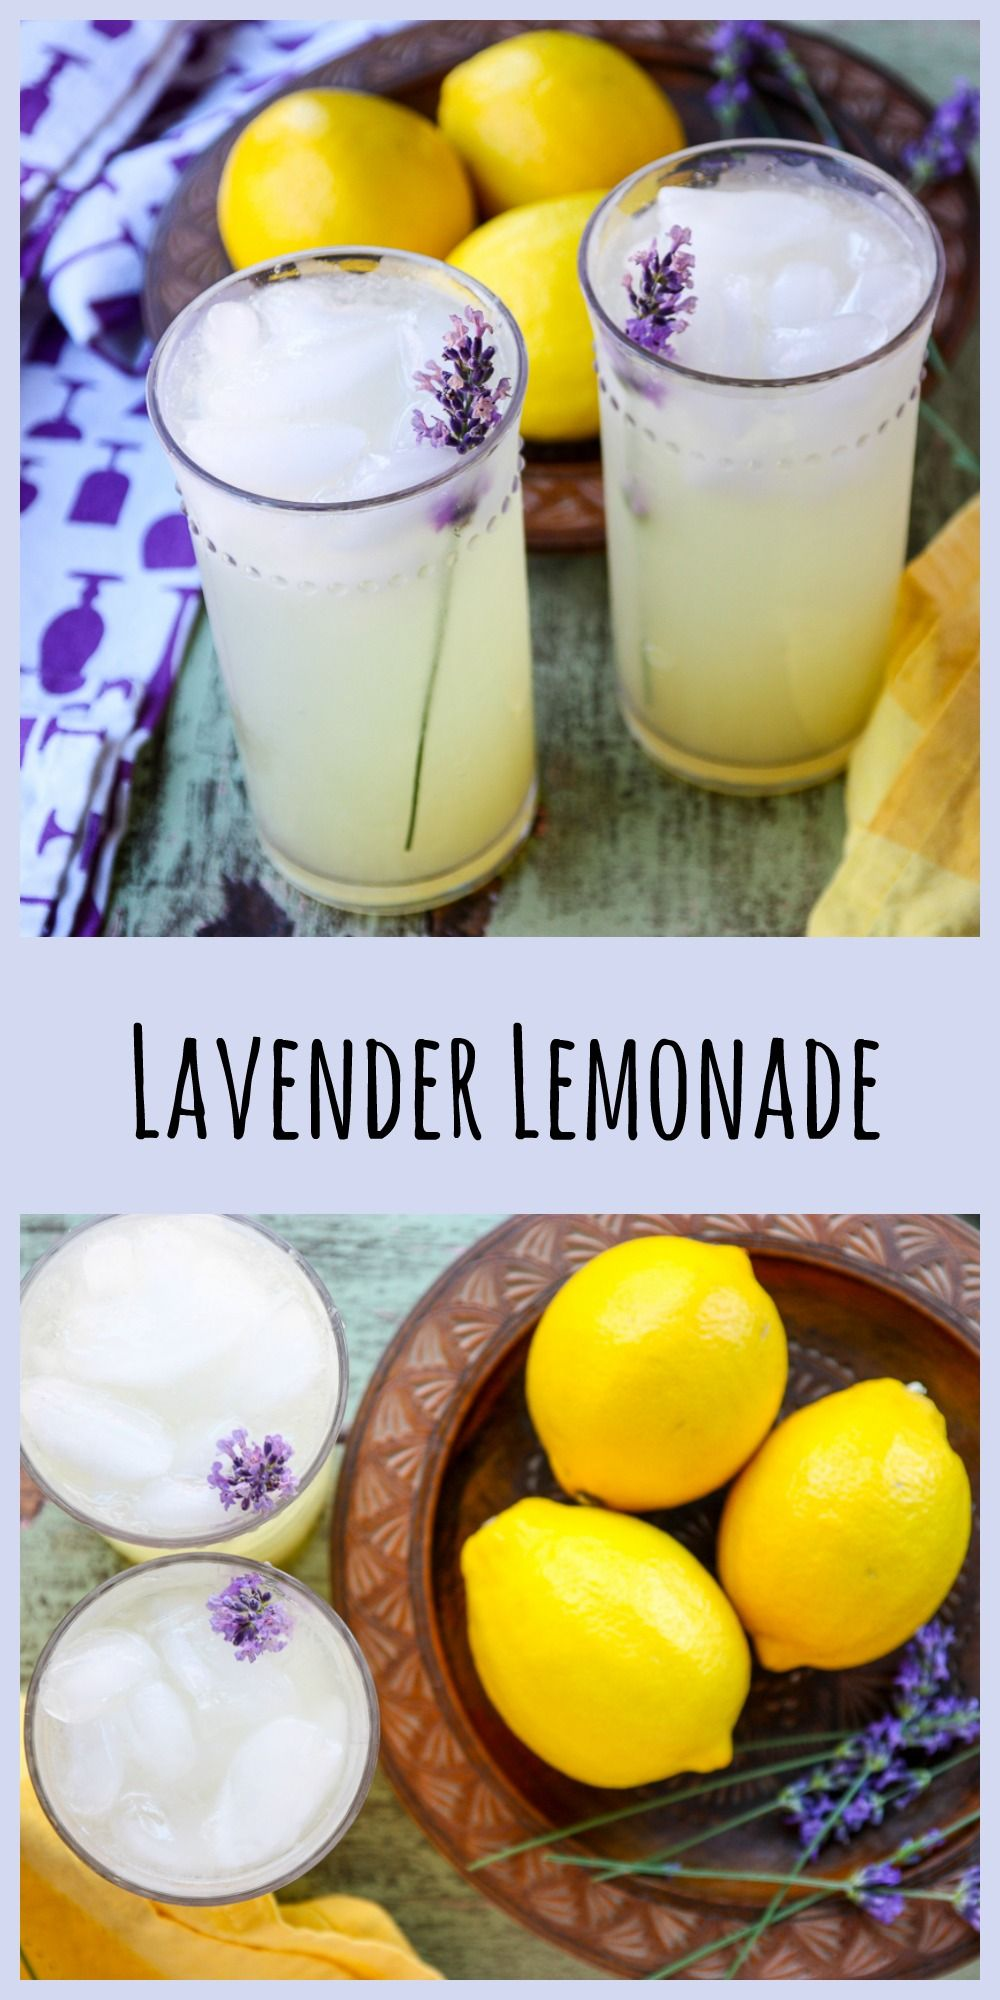 Lavender Lemonade Lemonade Recipe The Food Blog Recipe Lavender Lemonade Lavender Recipes Lemonade Recipes